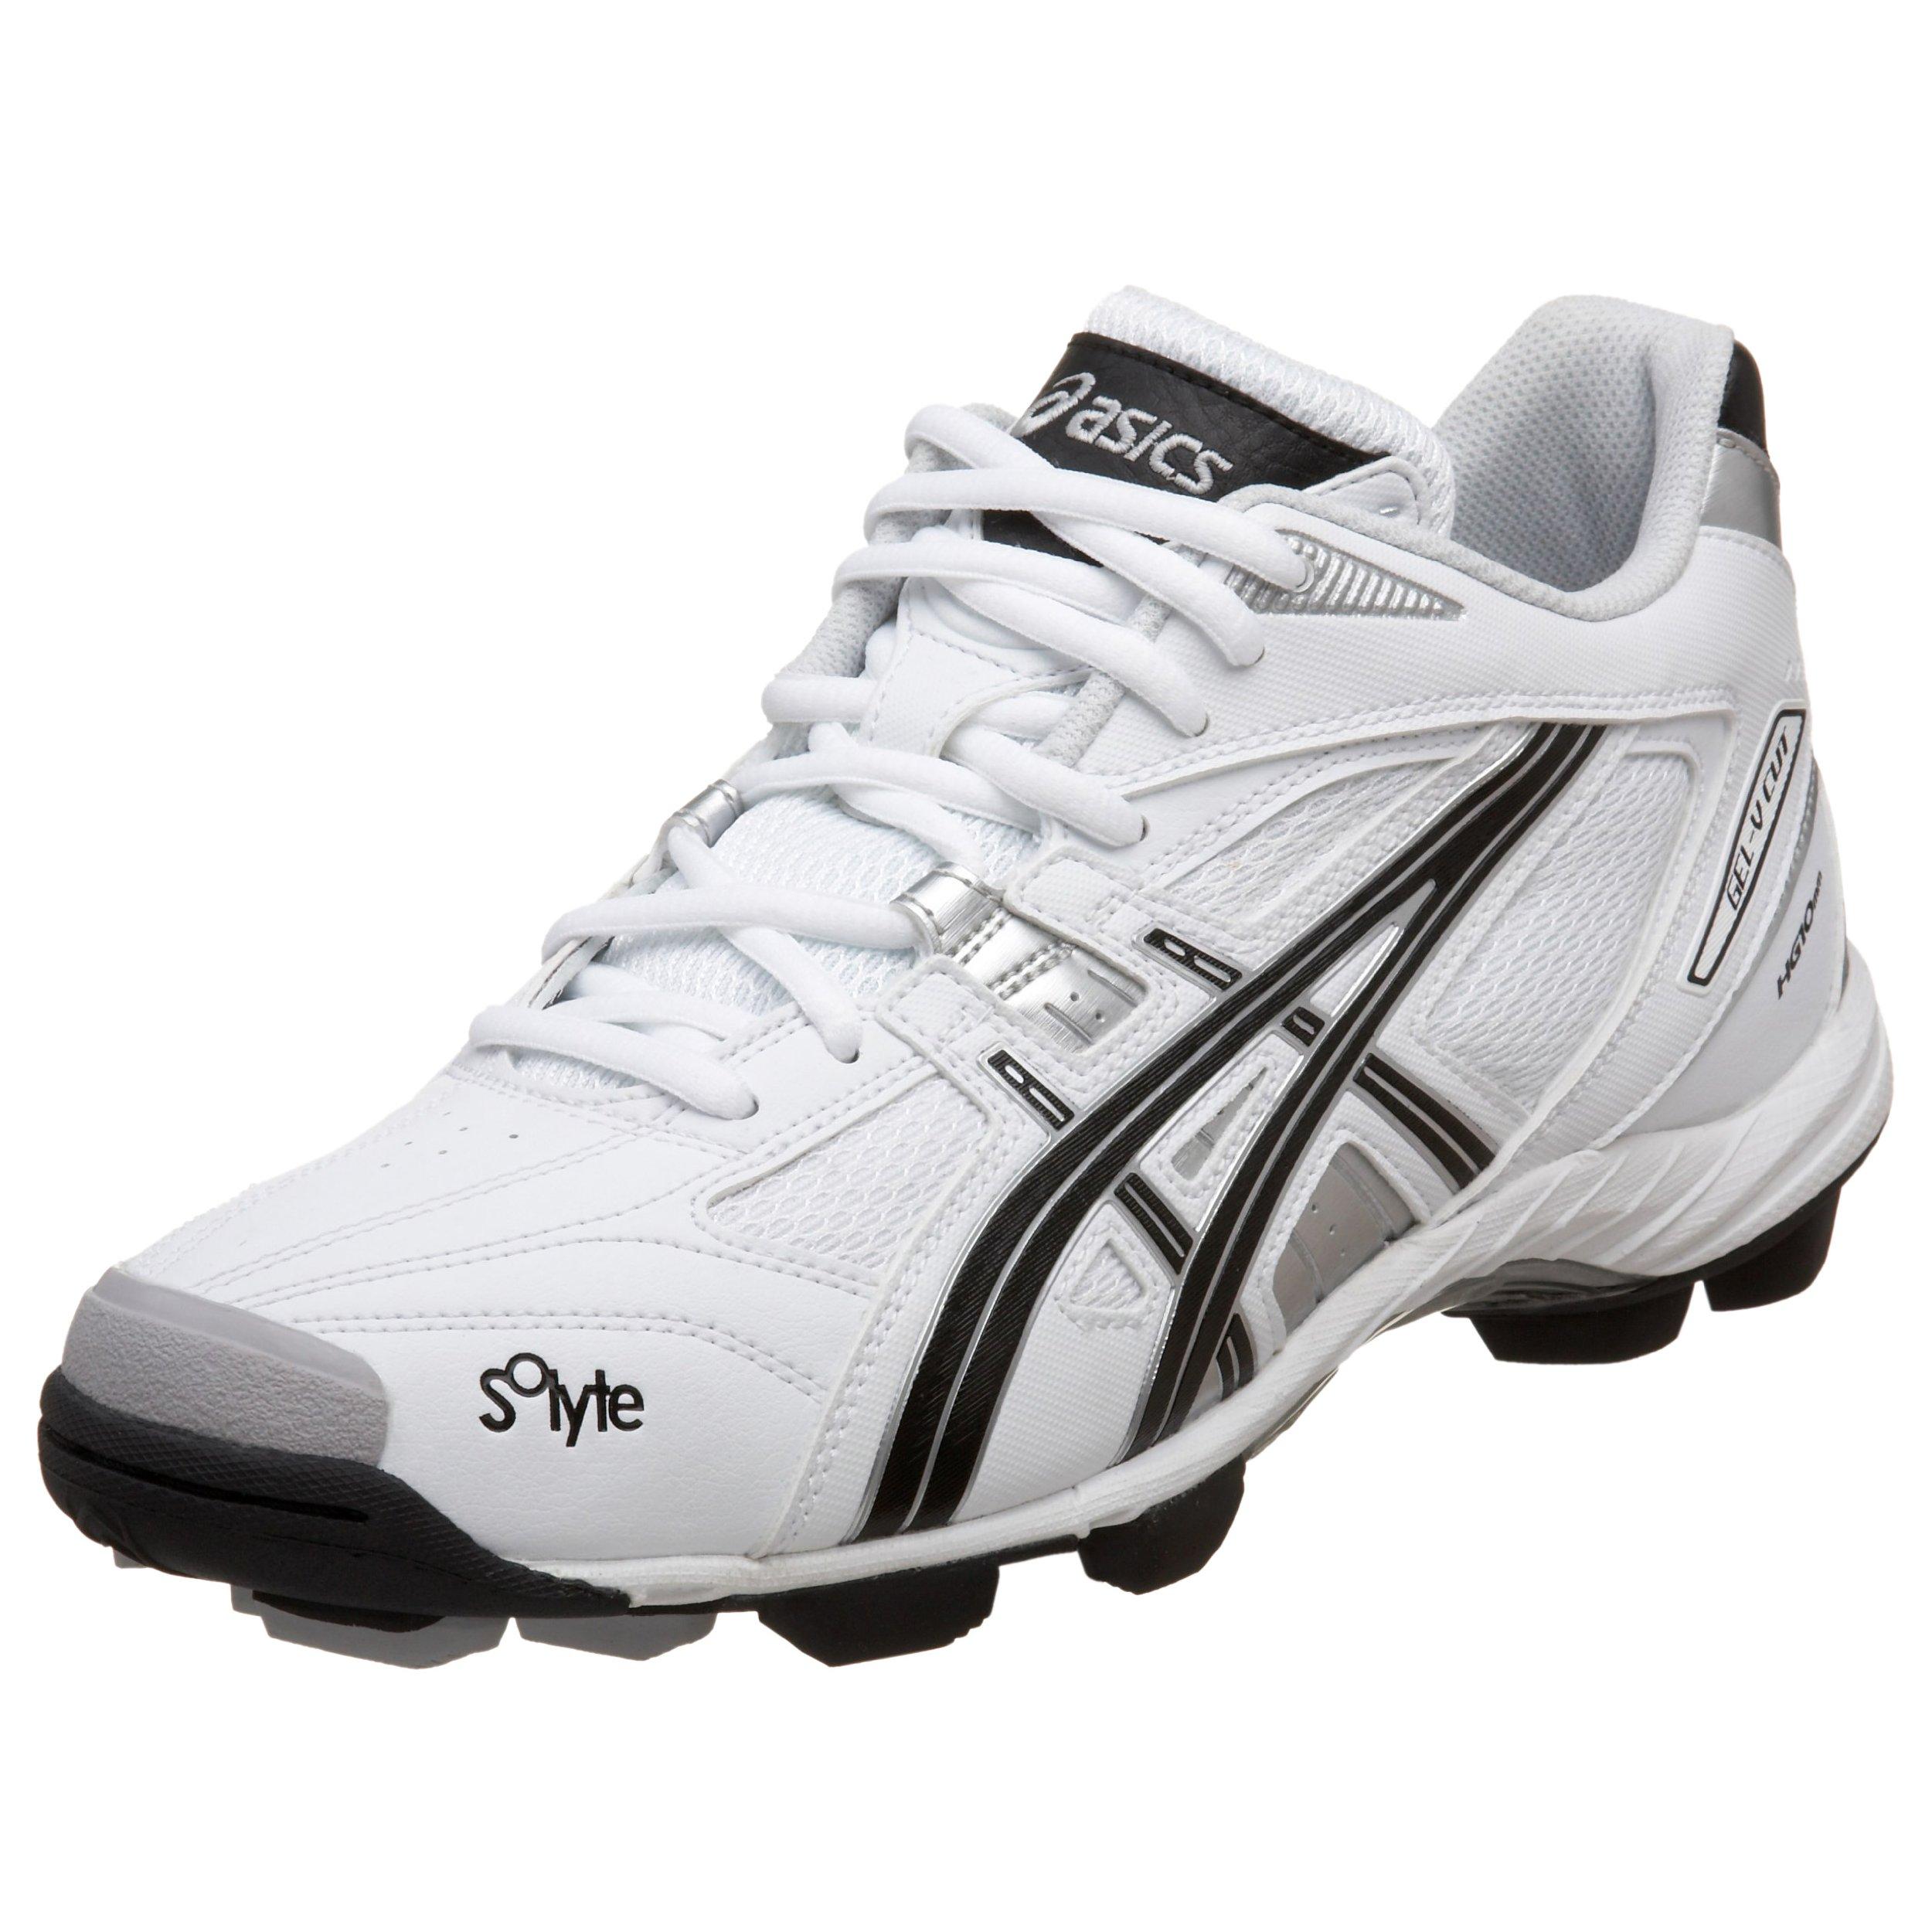 ASICS Men's GEL-V Cut MT Field Shoe,White/Black/Silver,8.5 D US by ASICS